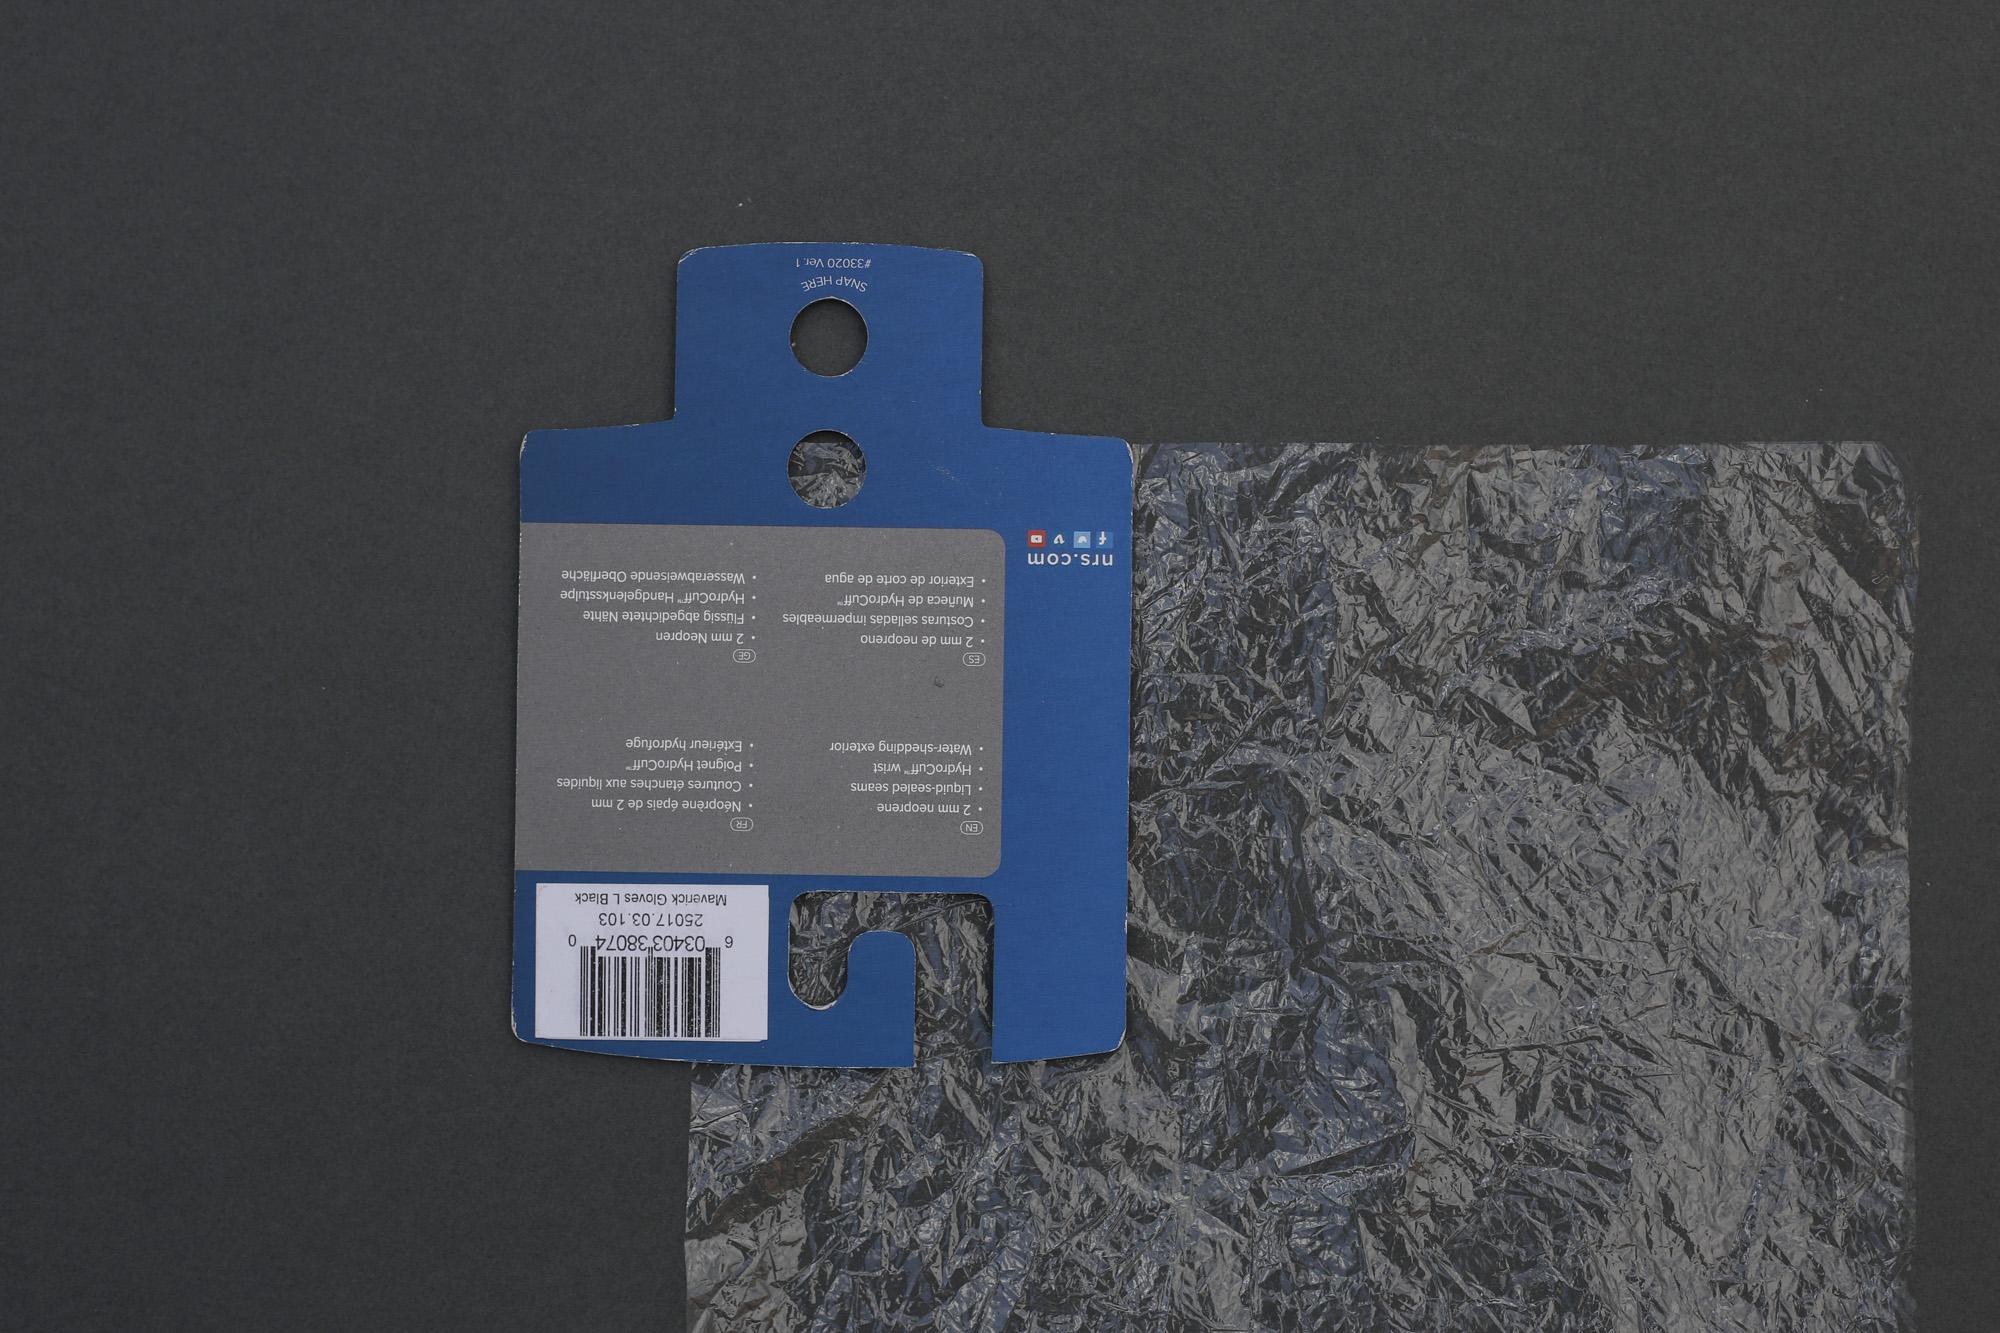 Unwrapped-65.jpg